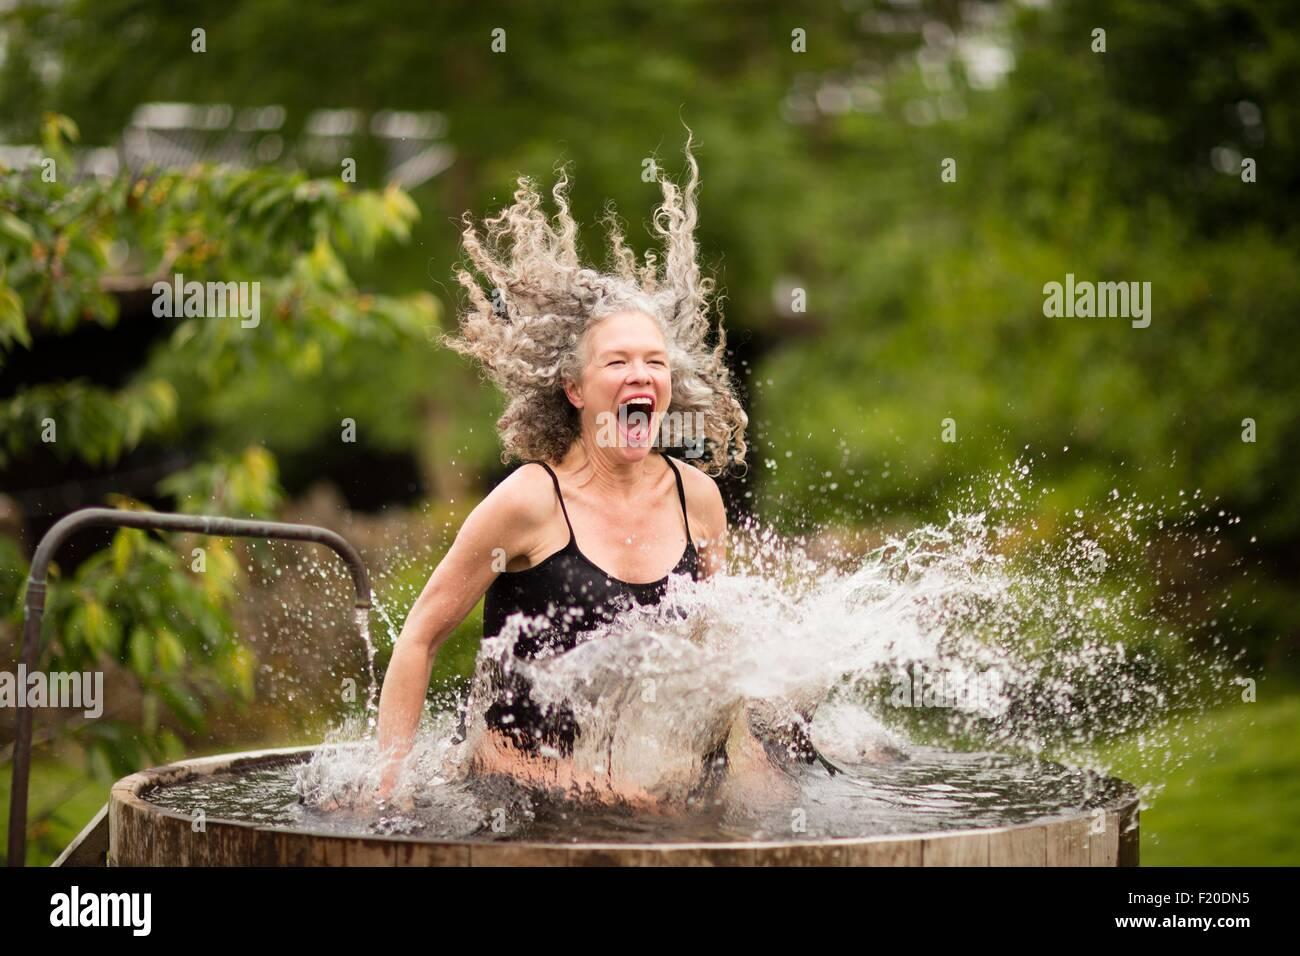 Mujer madura salpicar agua fría tina a eco retreat Imagen De Stock